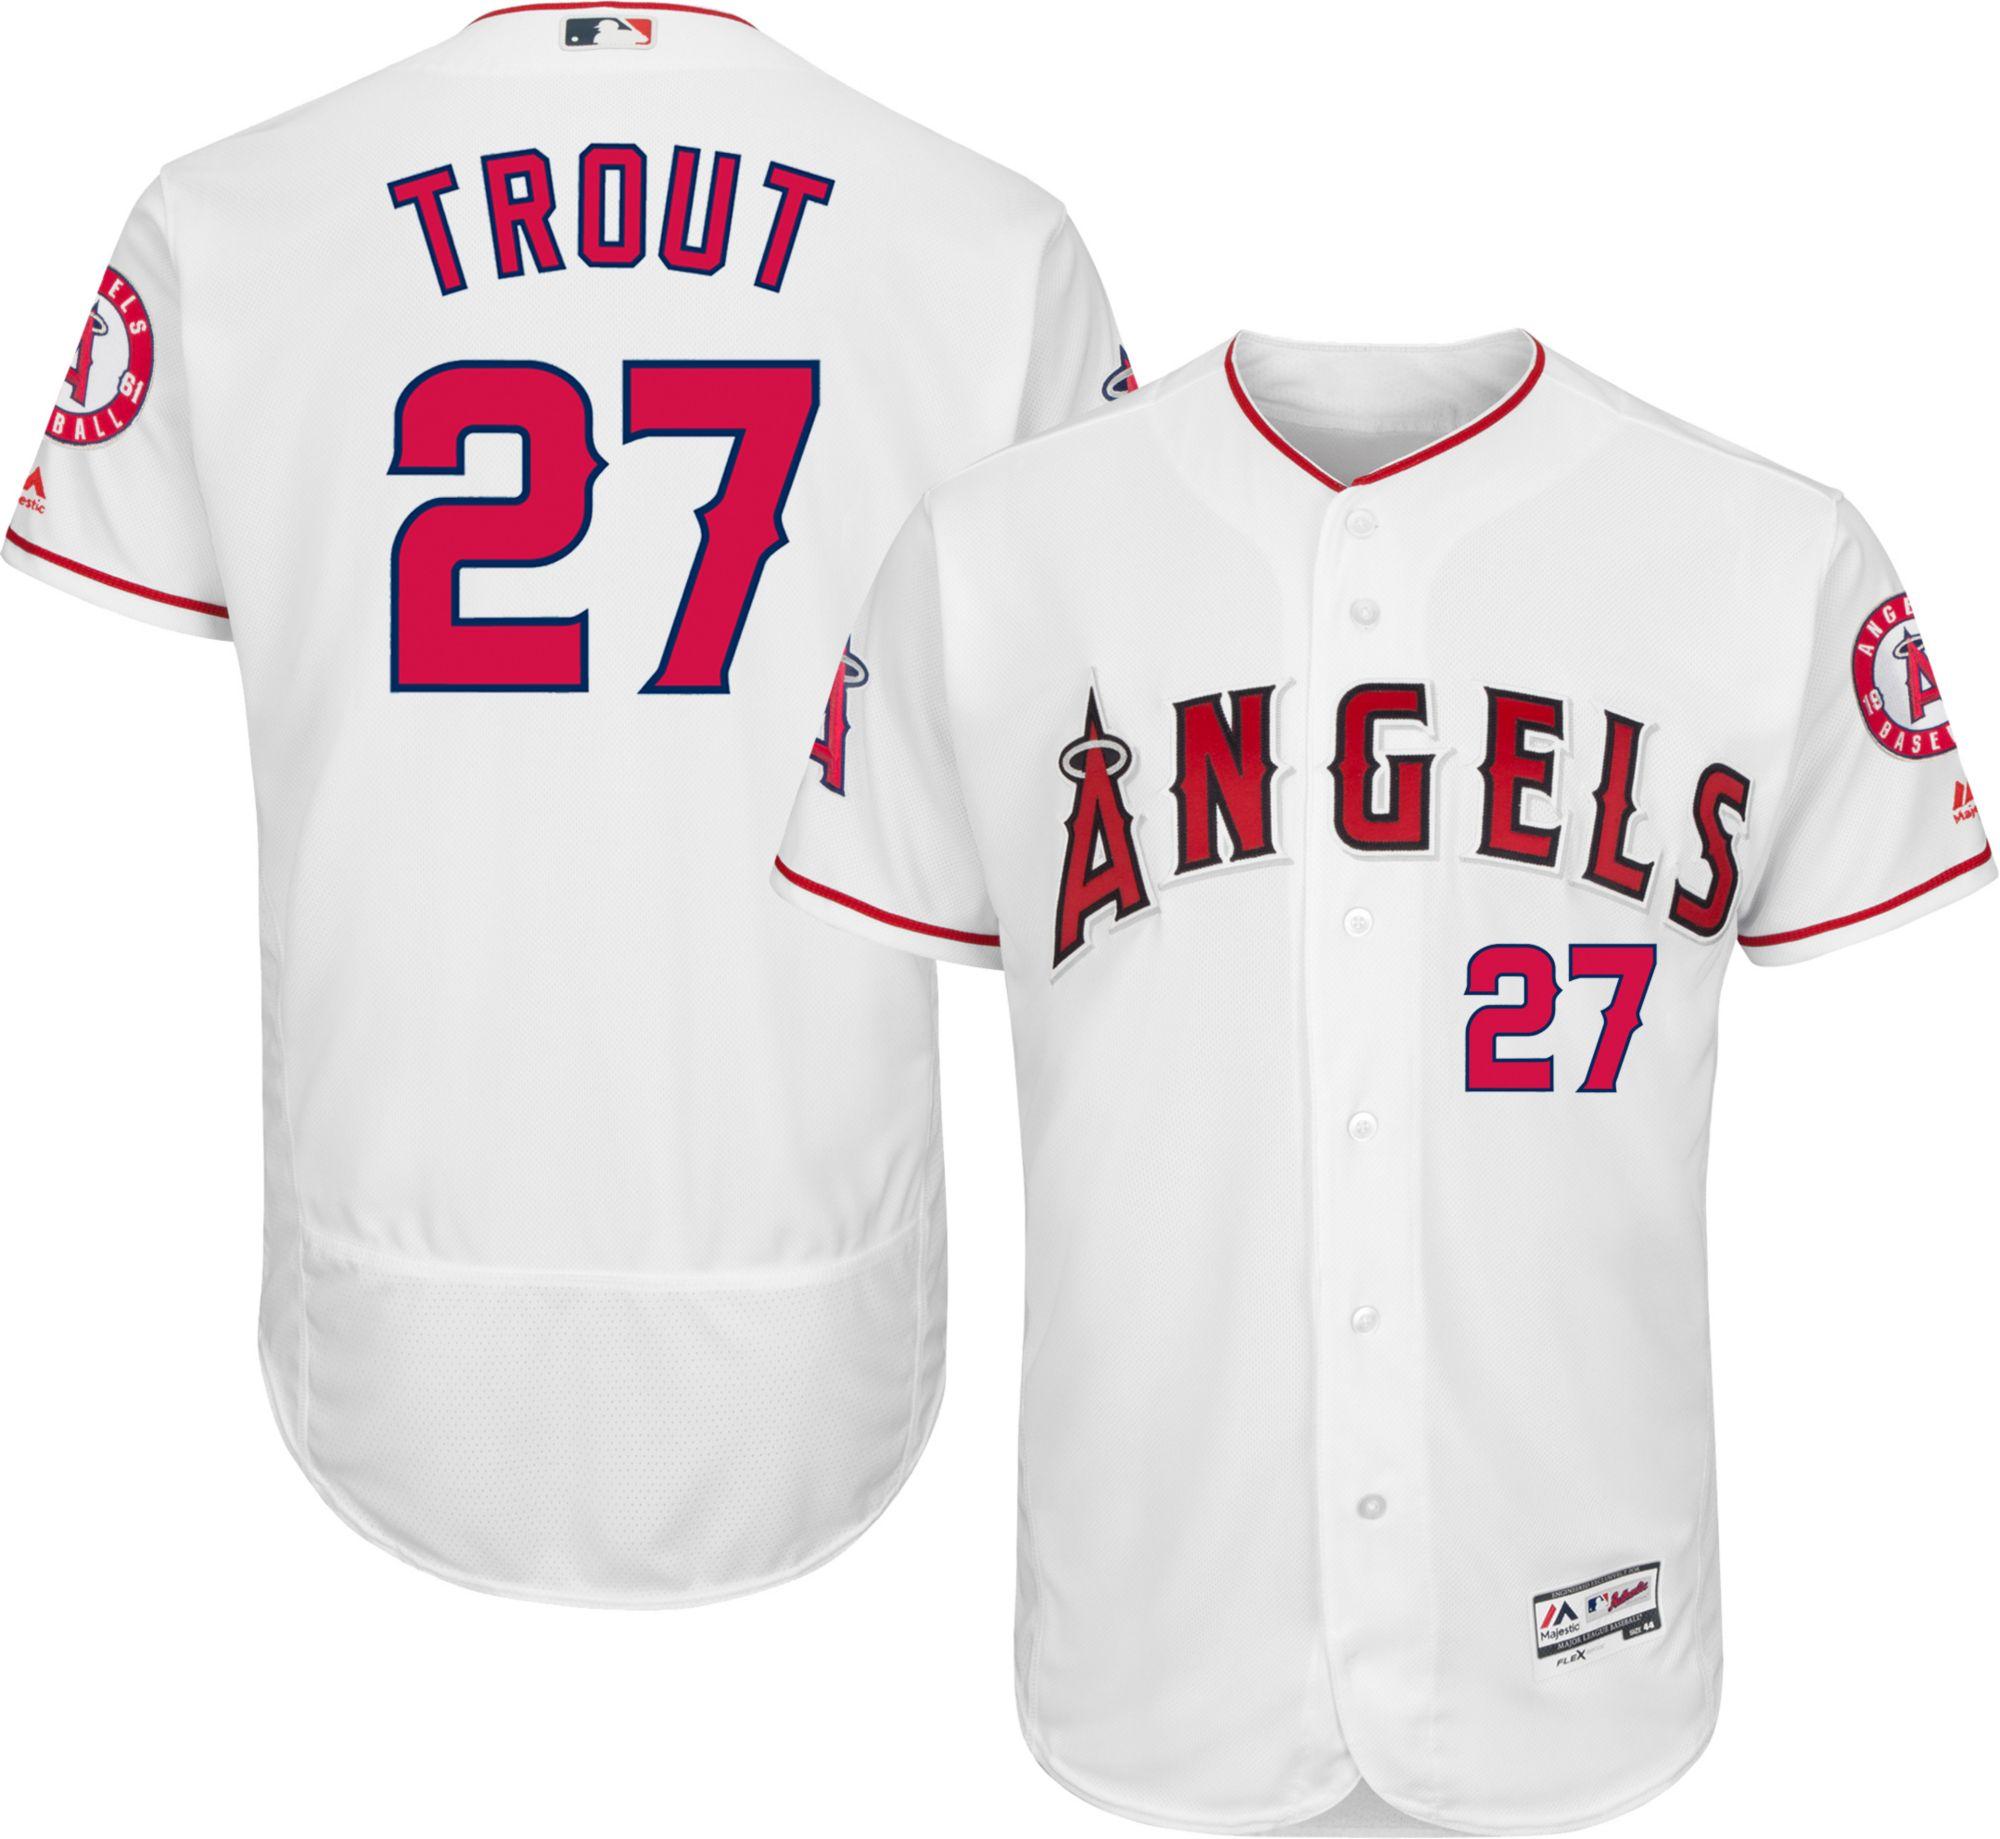 783fd75d2 ... base jersey e13d4 7e17d  where can i buy majestic mens authentic los  angeles angels mike trout 27 home white flex